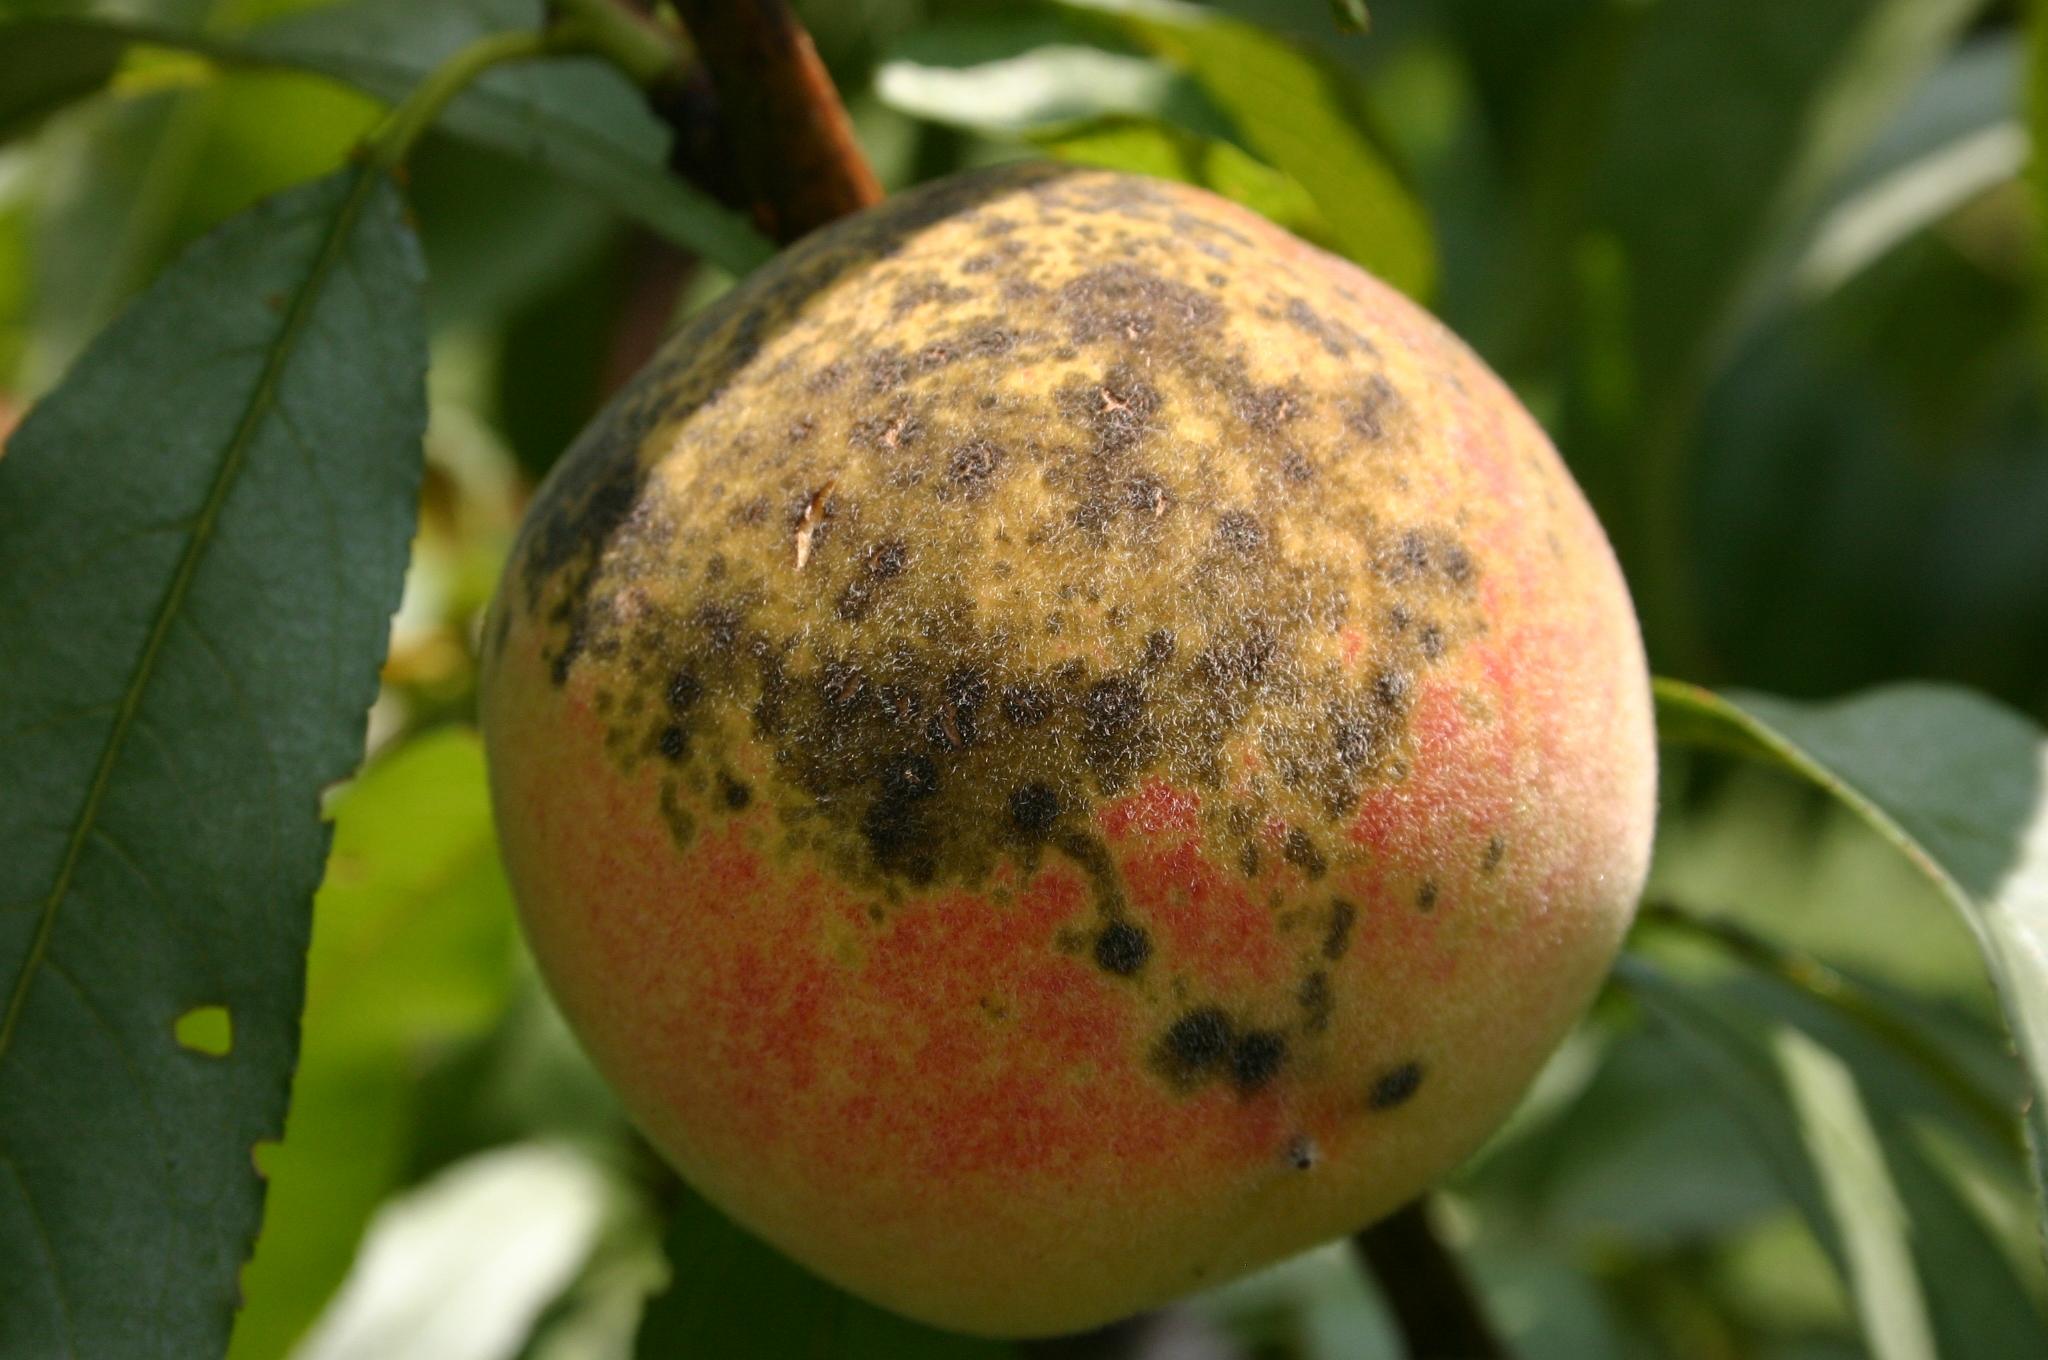 Growing Fruit Spray Guide Walter Reeves The Georgia